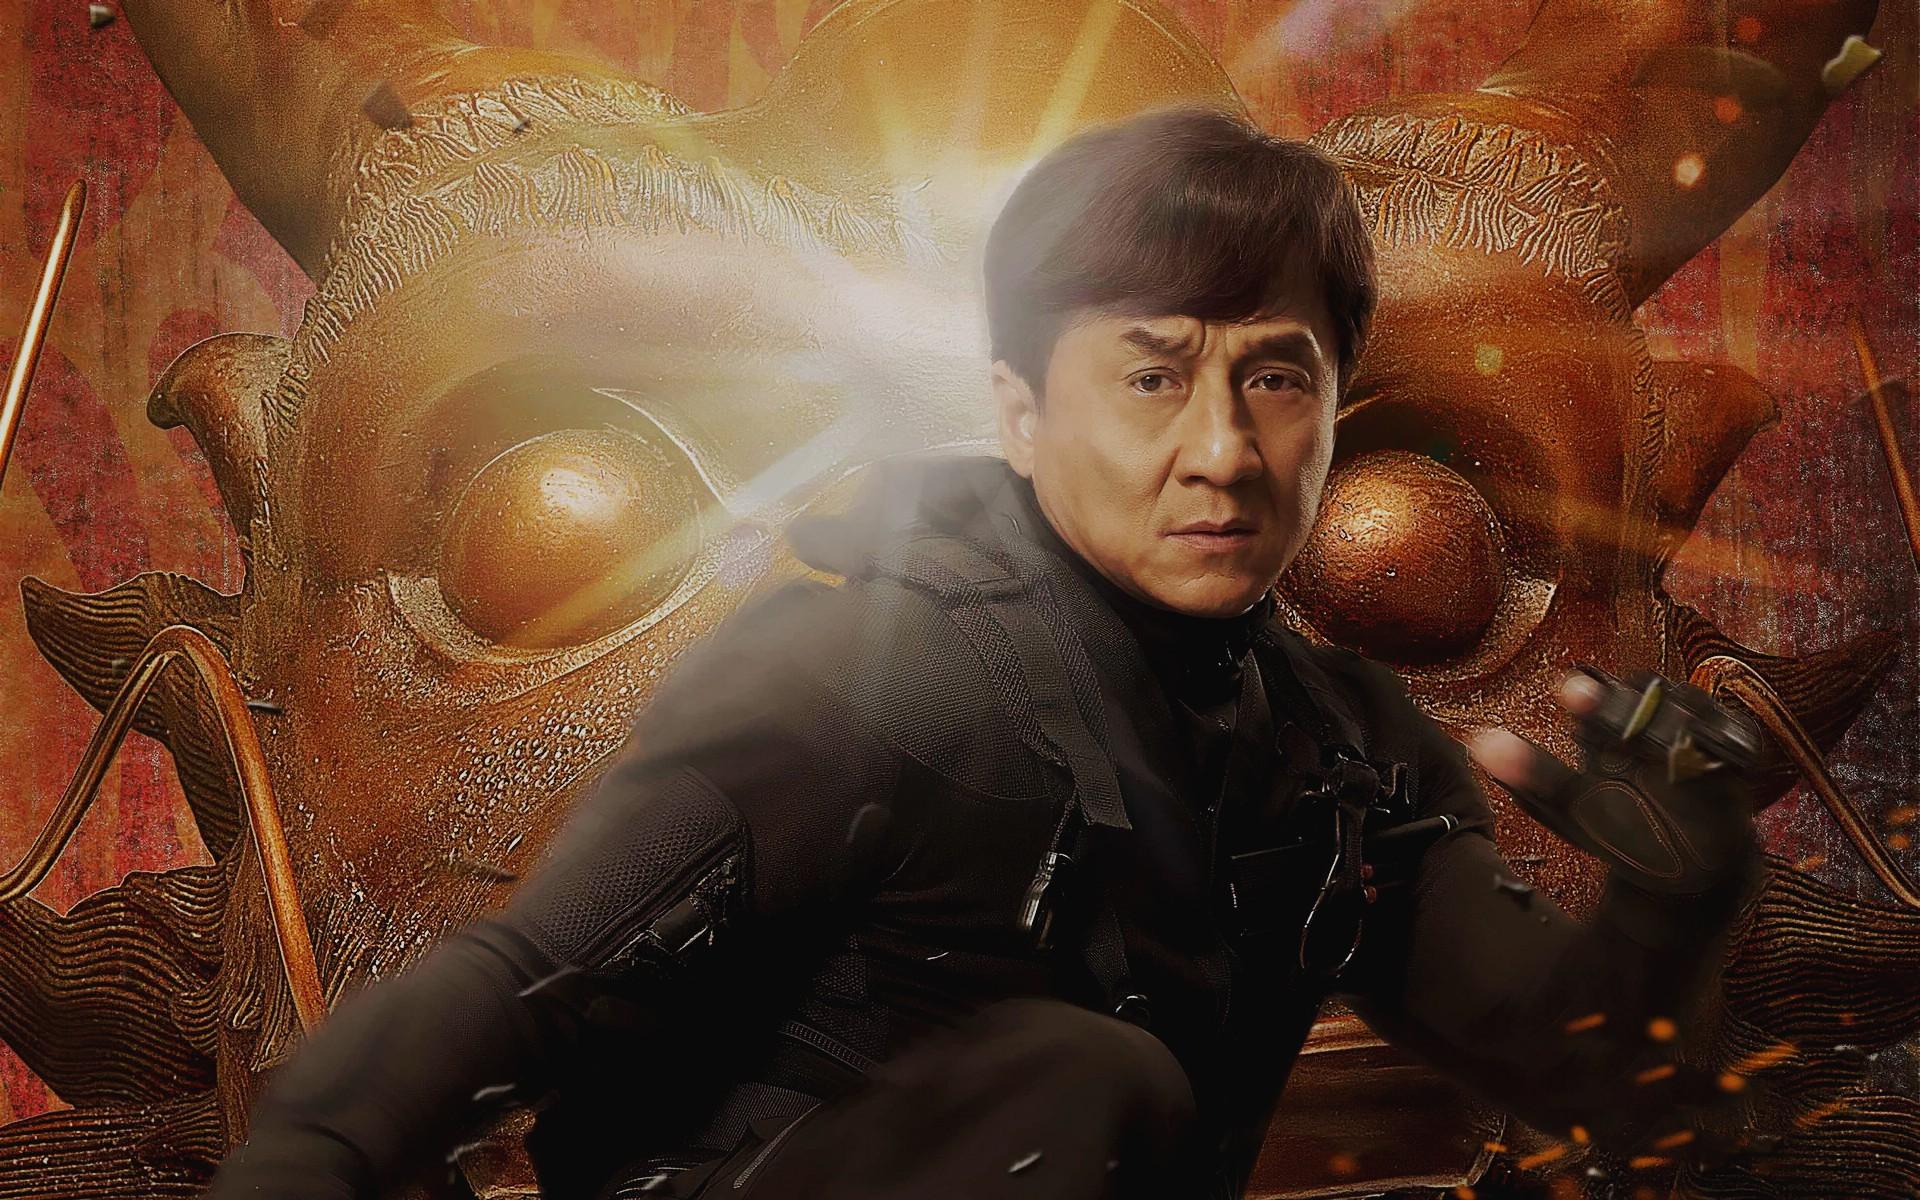 Jackie Chan Desktop Wallpaper Wallpapers High Quality Download Free